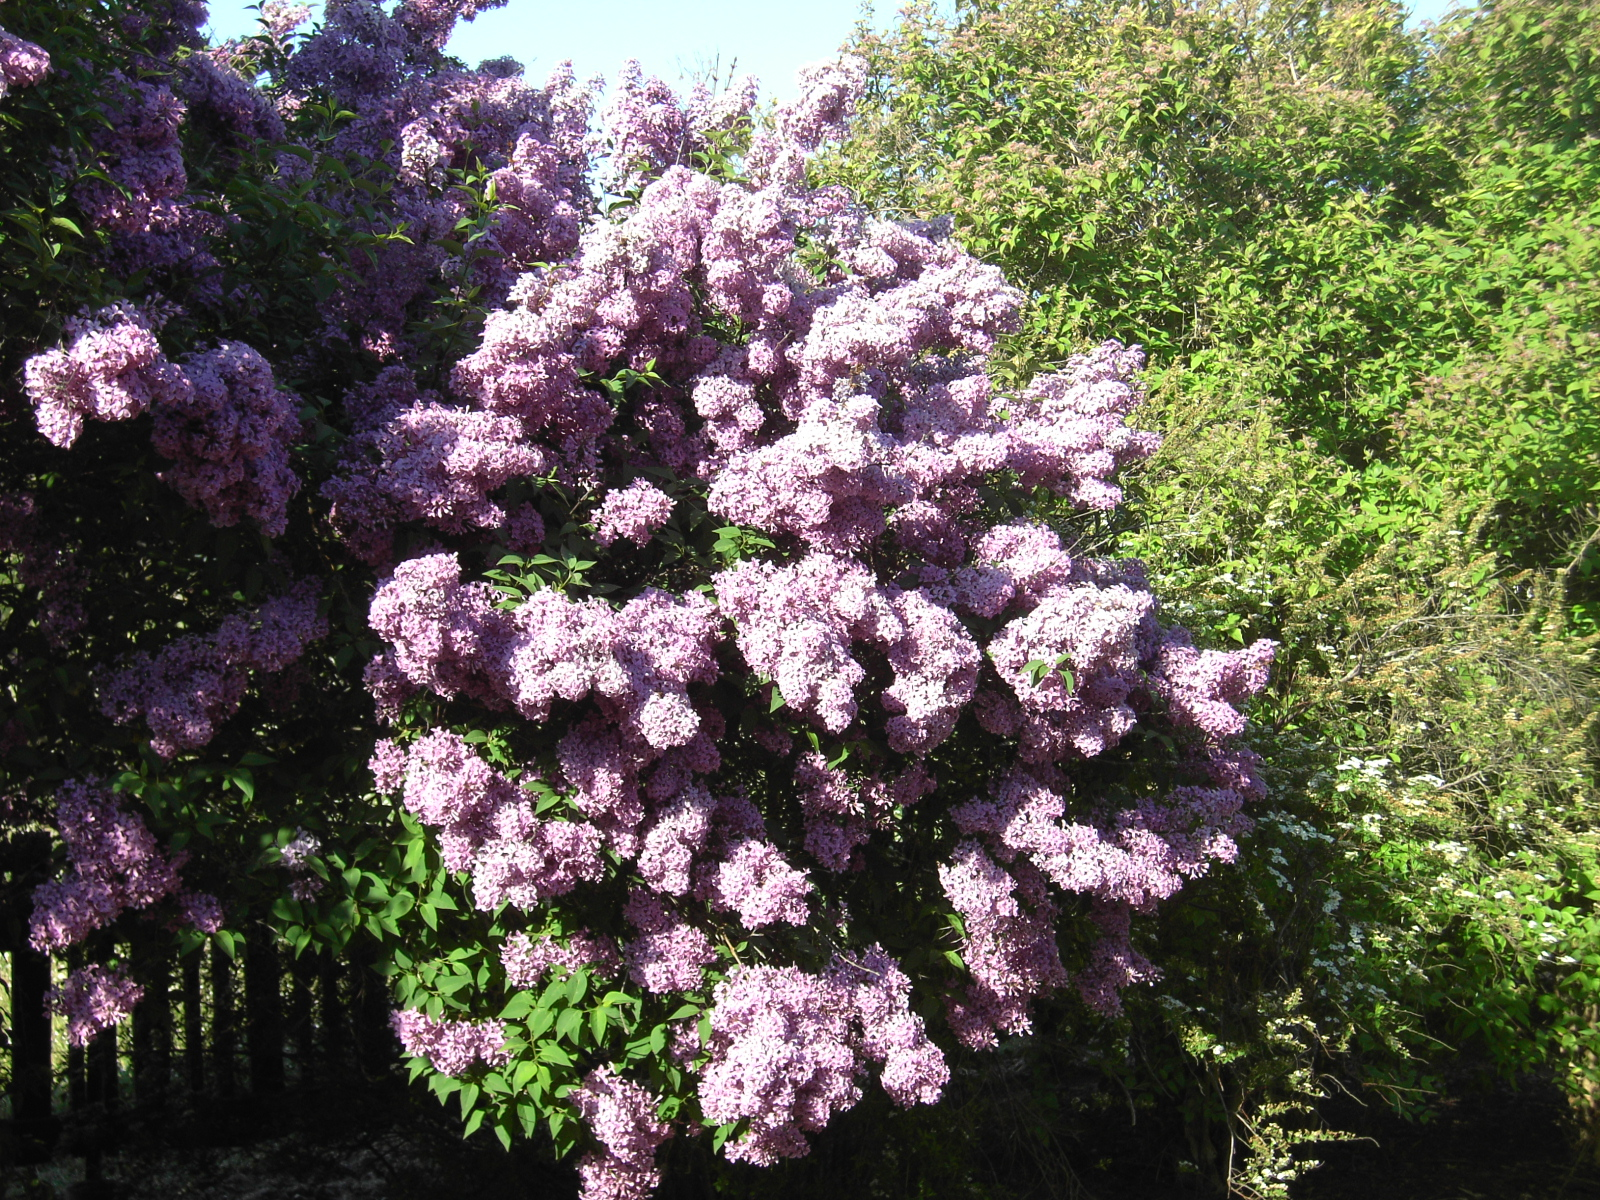 File syringa vulgaris in wikimedia commons - Syringa vulgaris ...